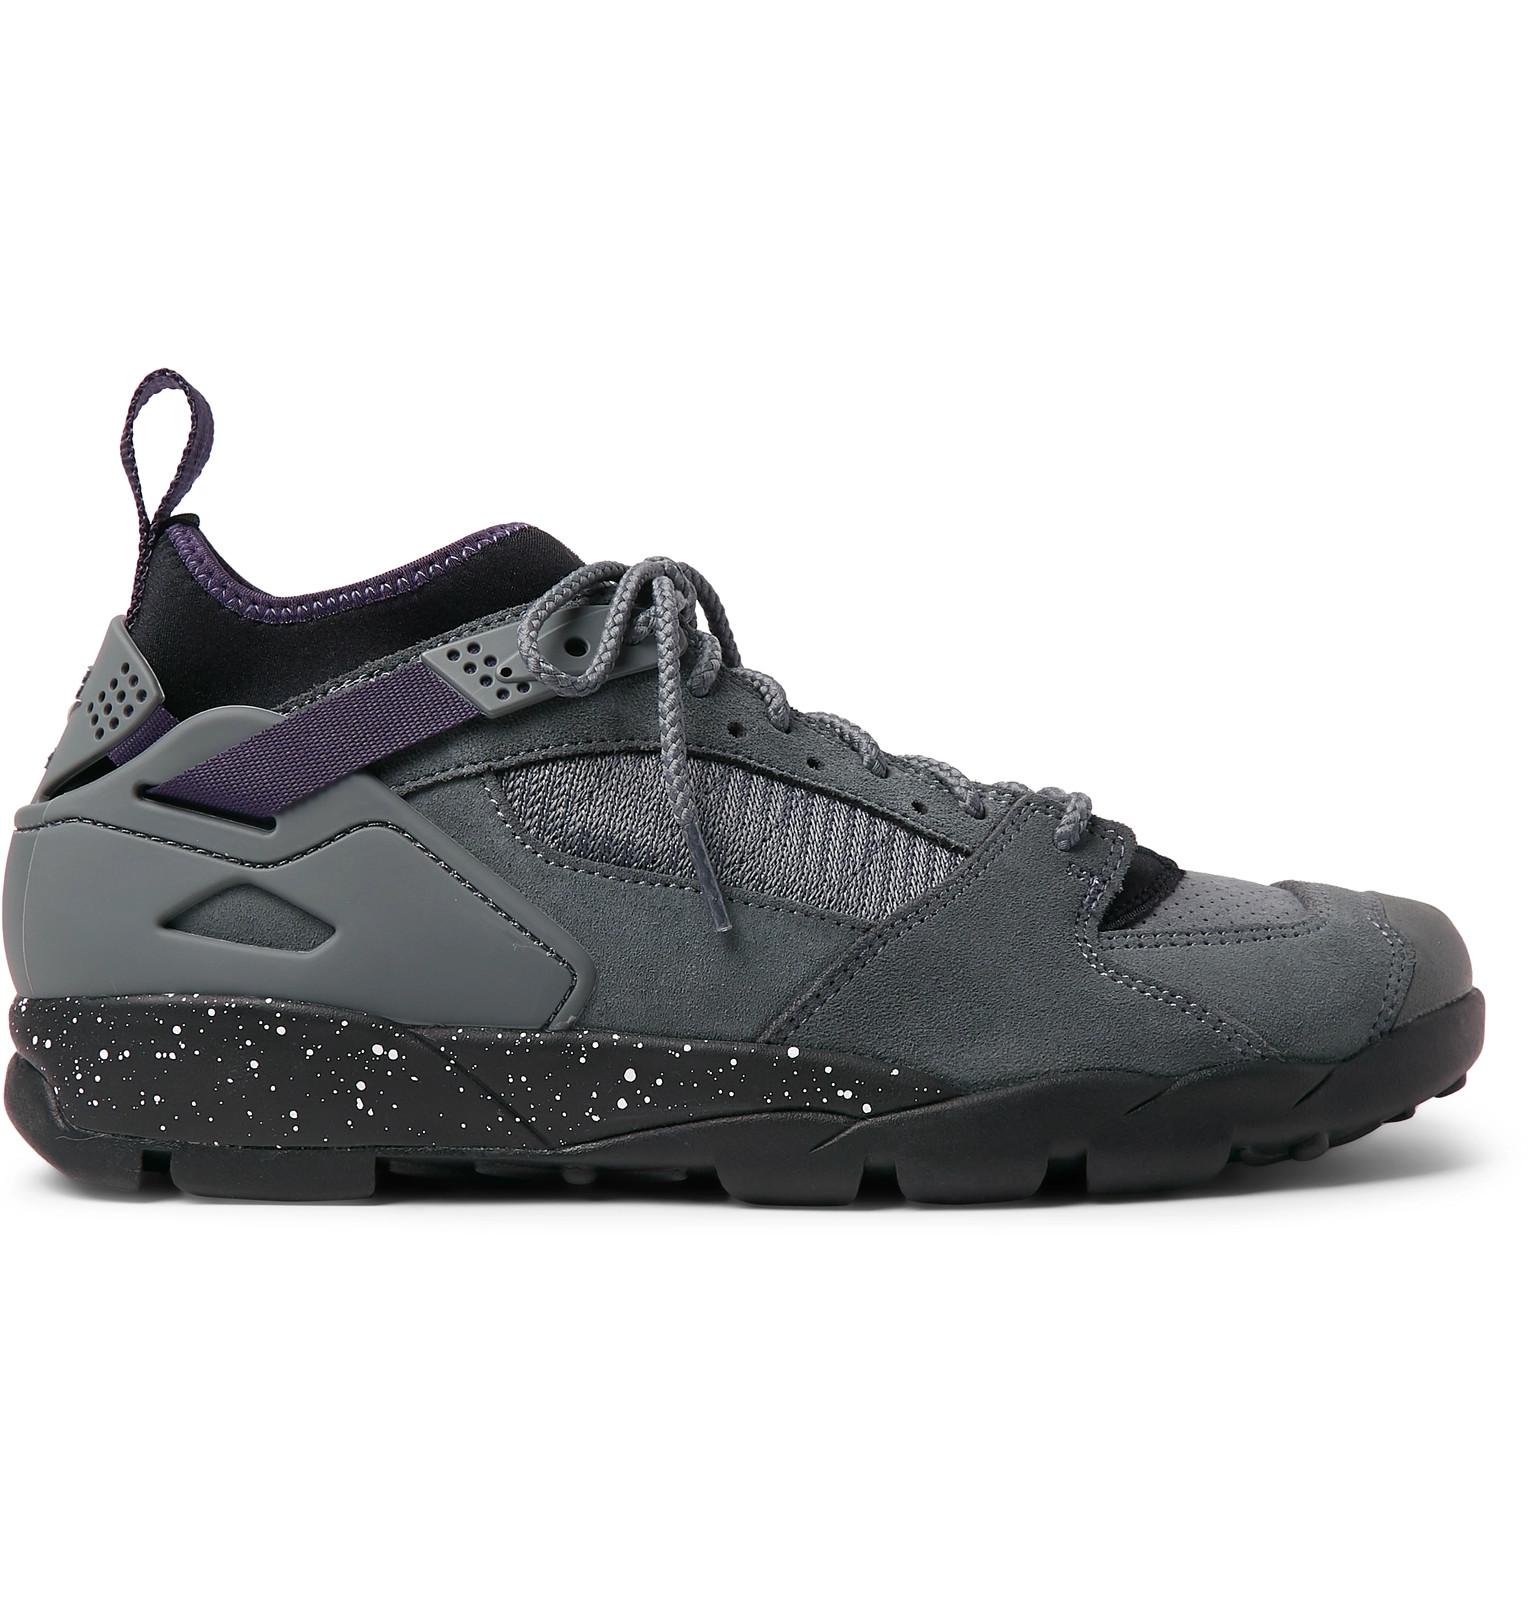 Neoprene Air And Mesh Revaderchi Acg Suede Sneakers Nike 45Yqg